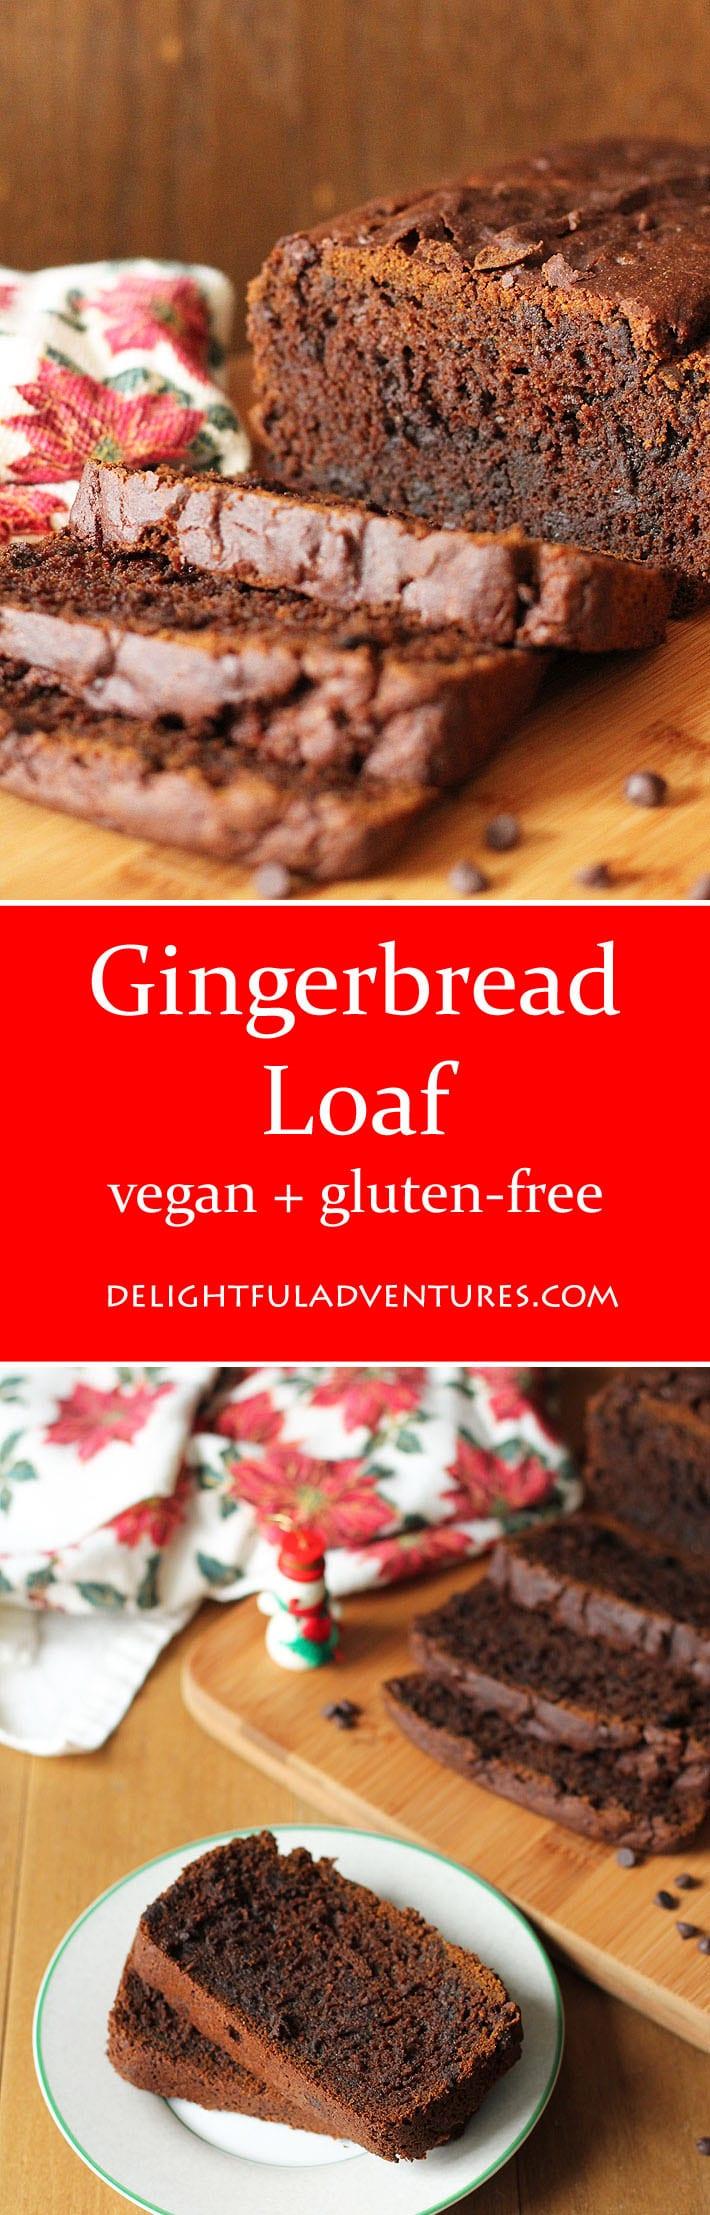 Vegan Gluten Free Gingerbread Loaf - Delightful Adventures